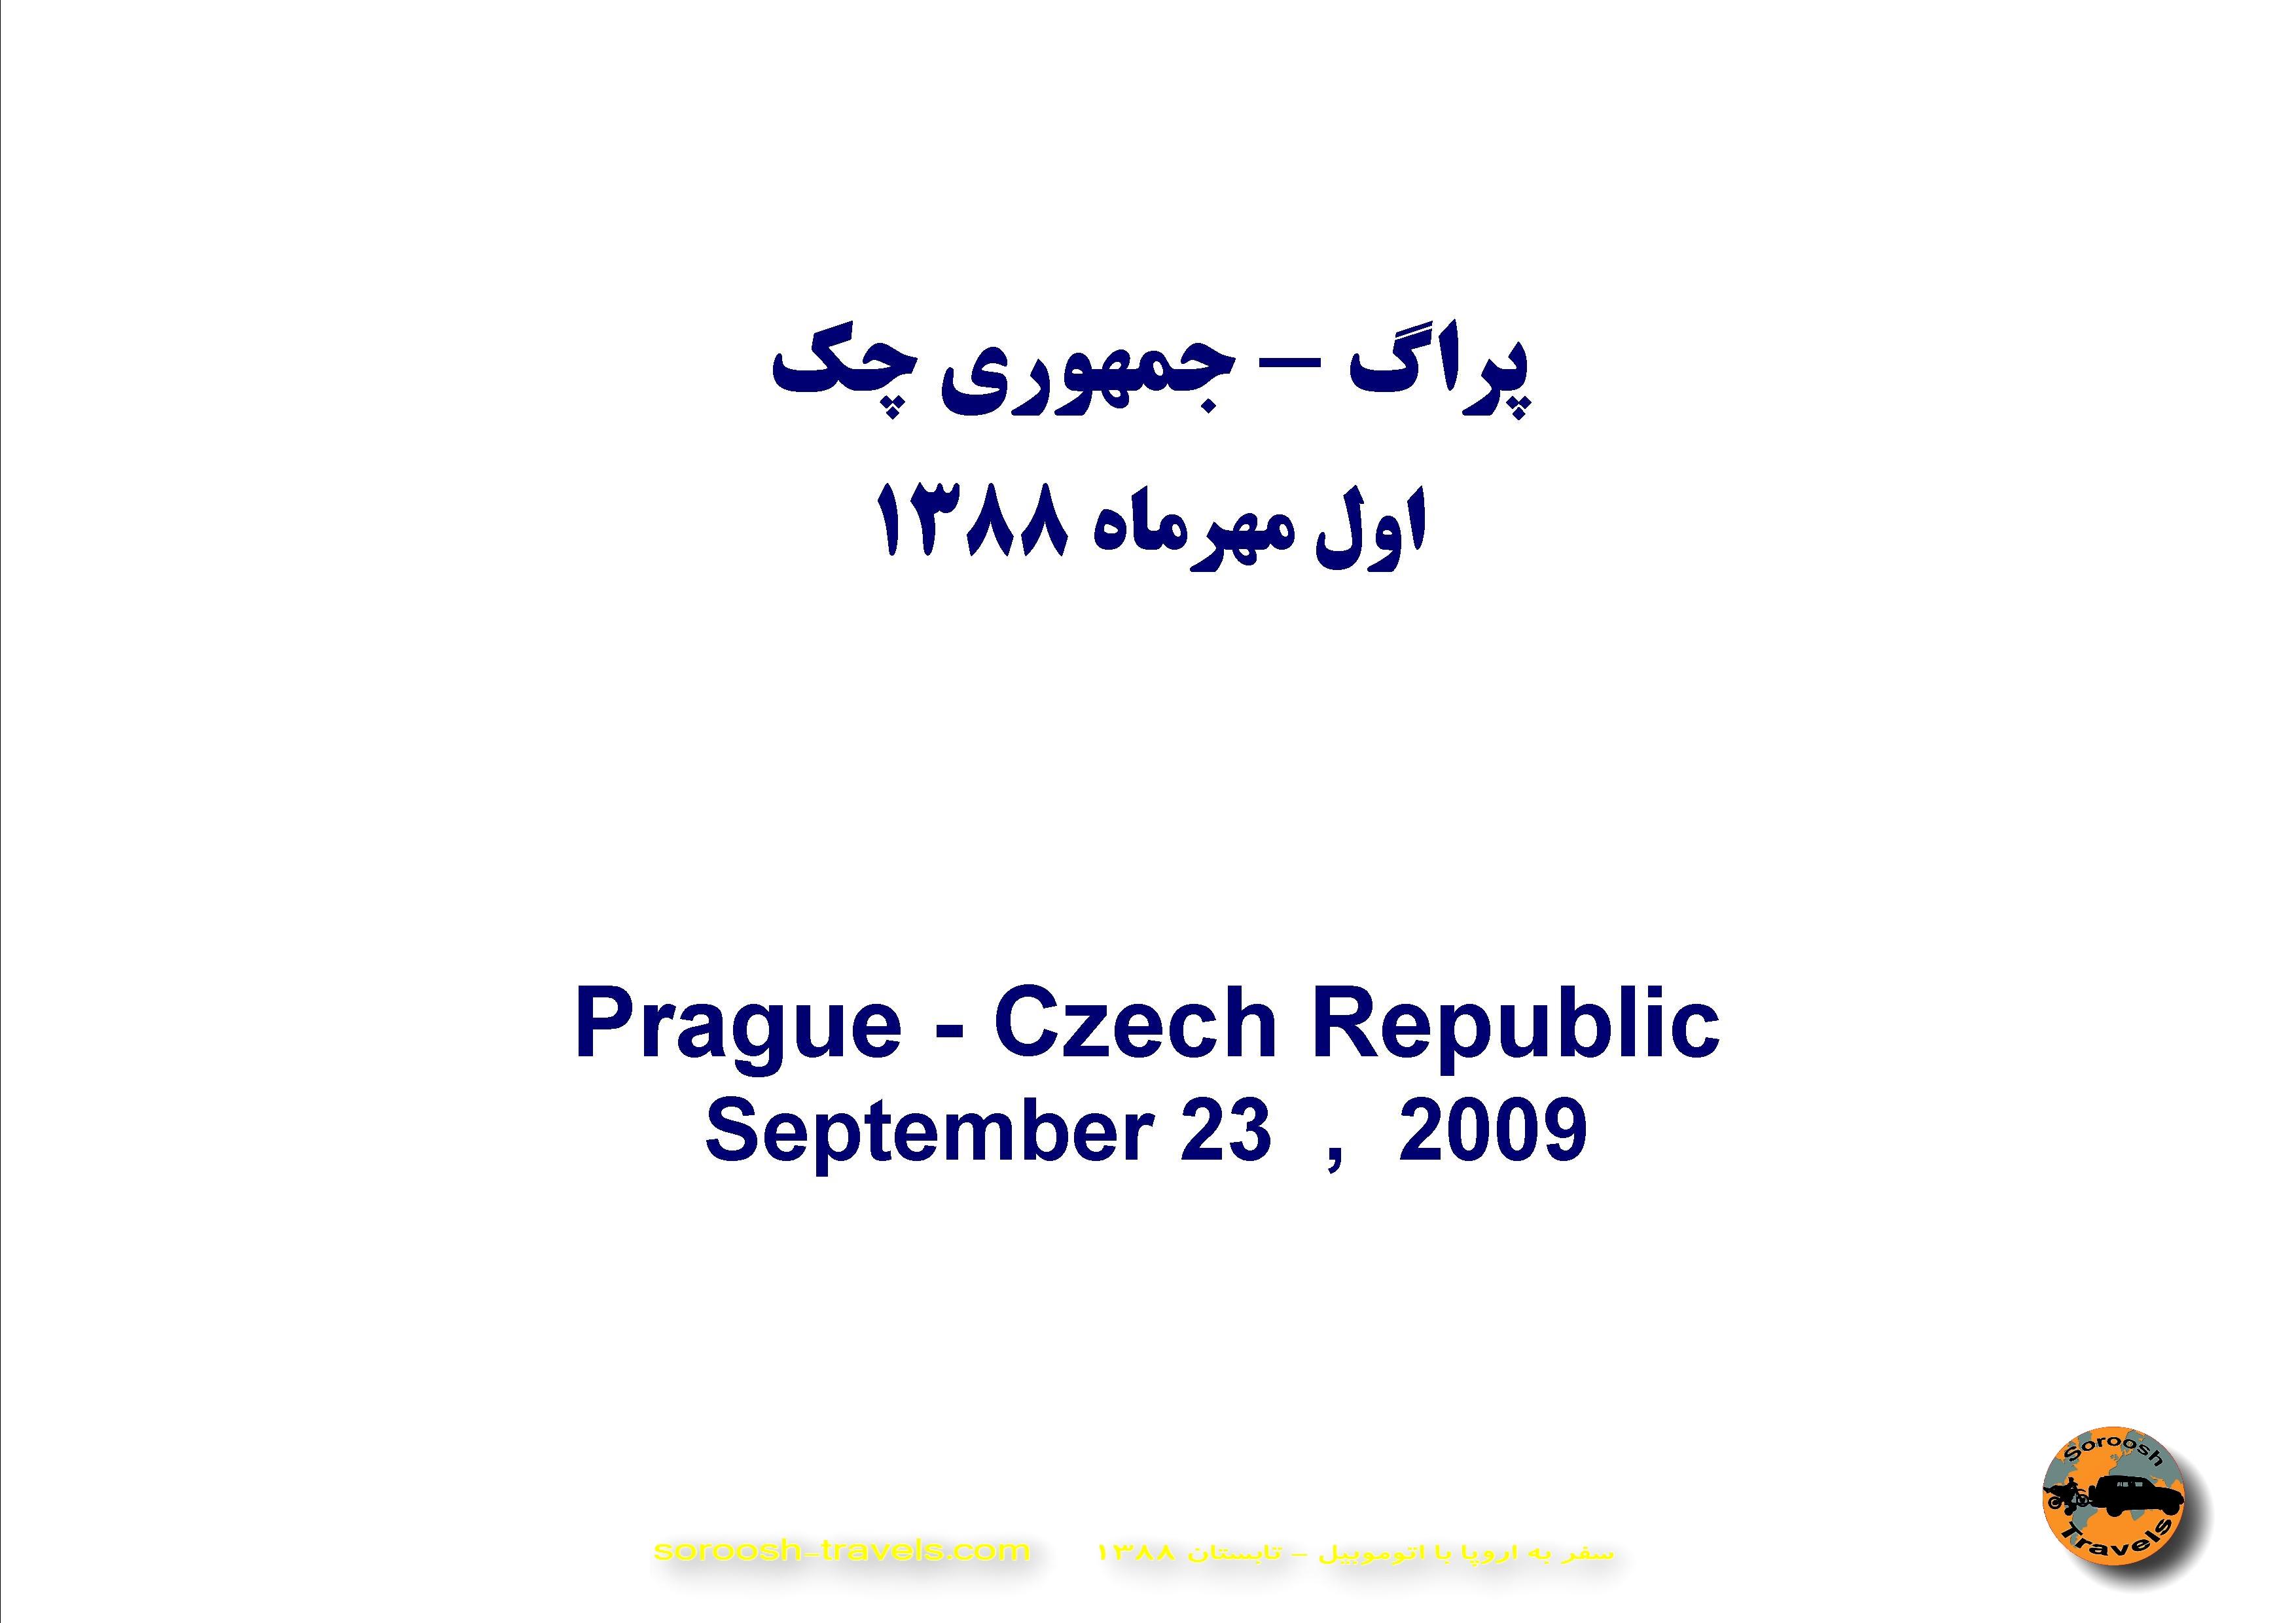 01-mehr-1388-23-september-2009-prague-0